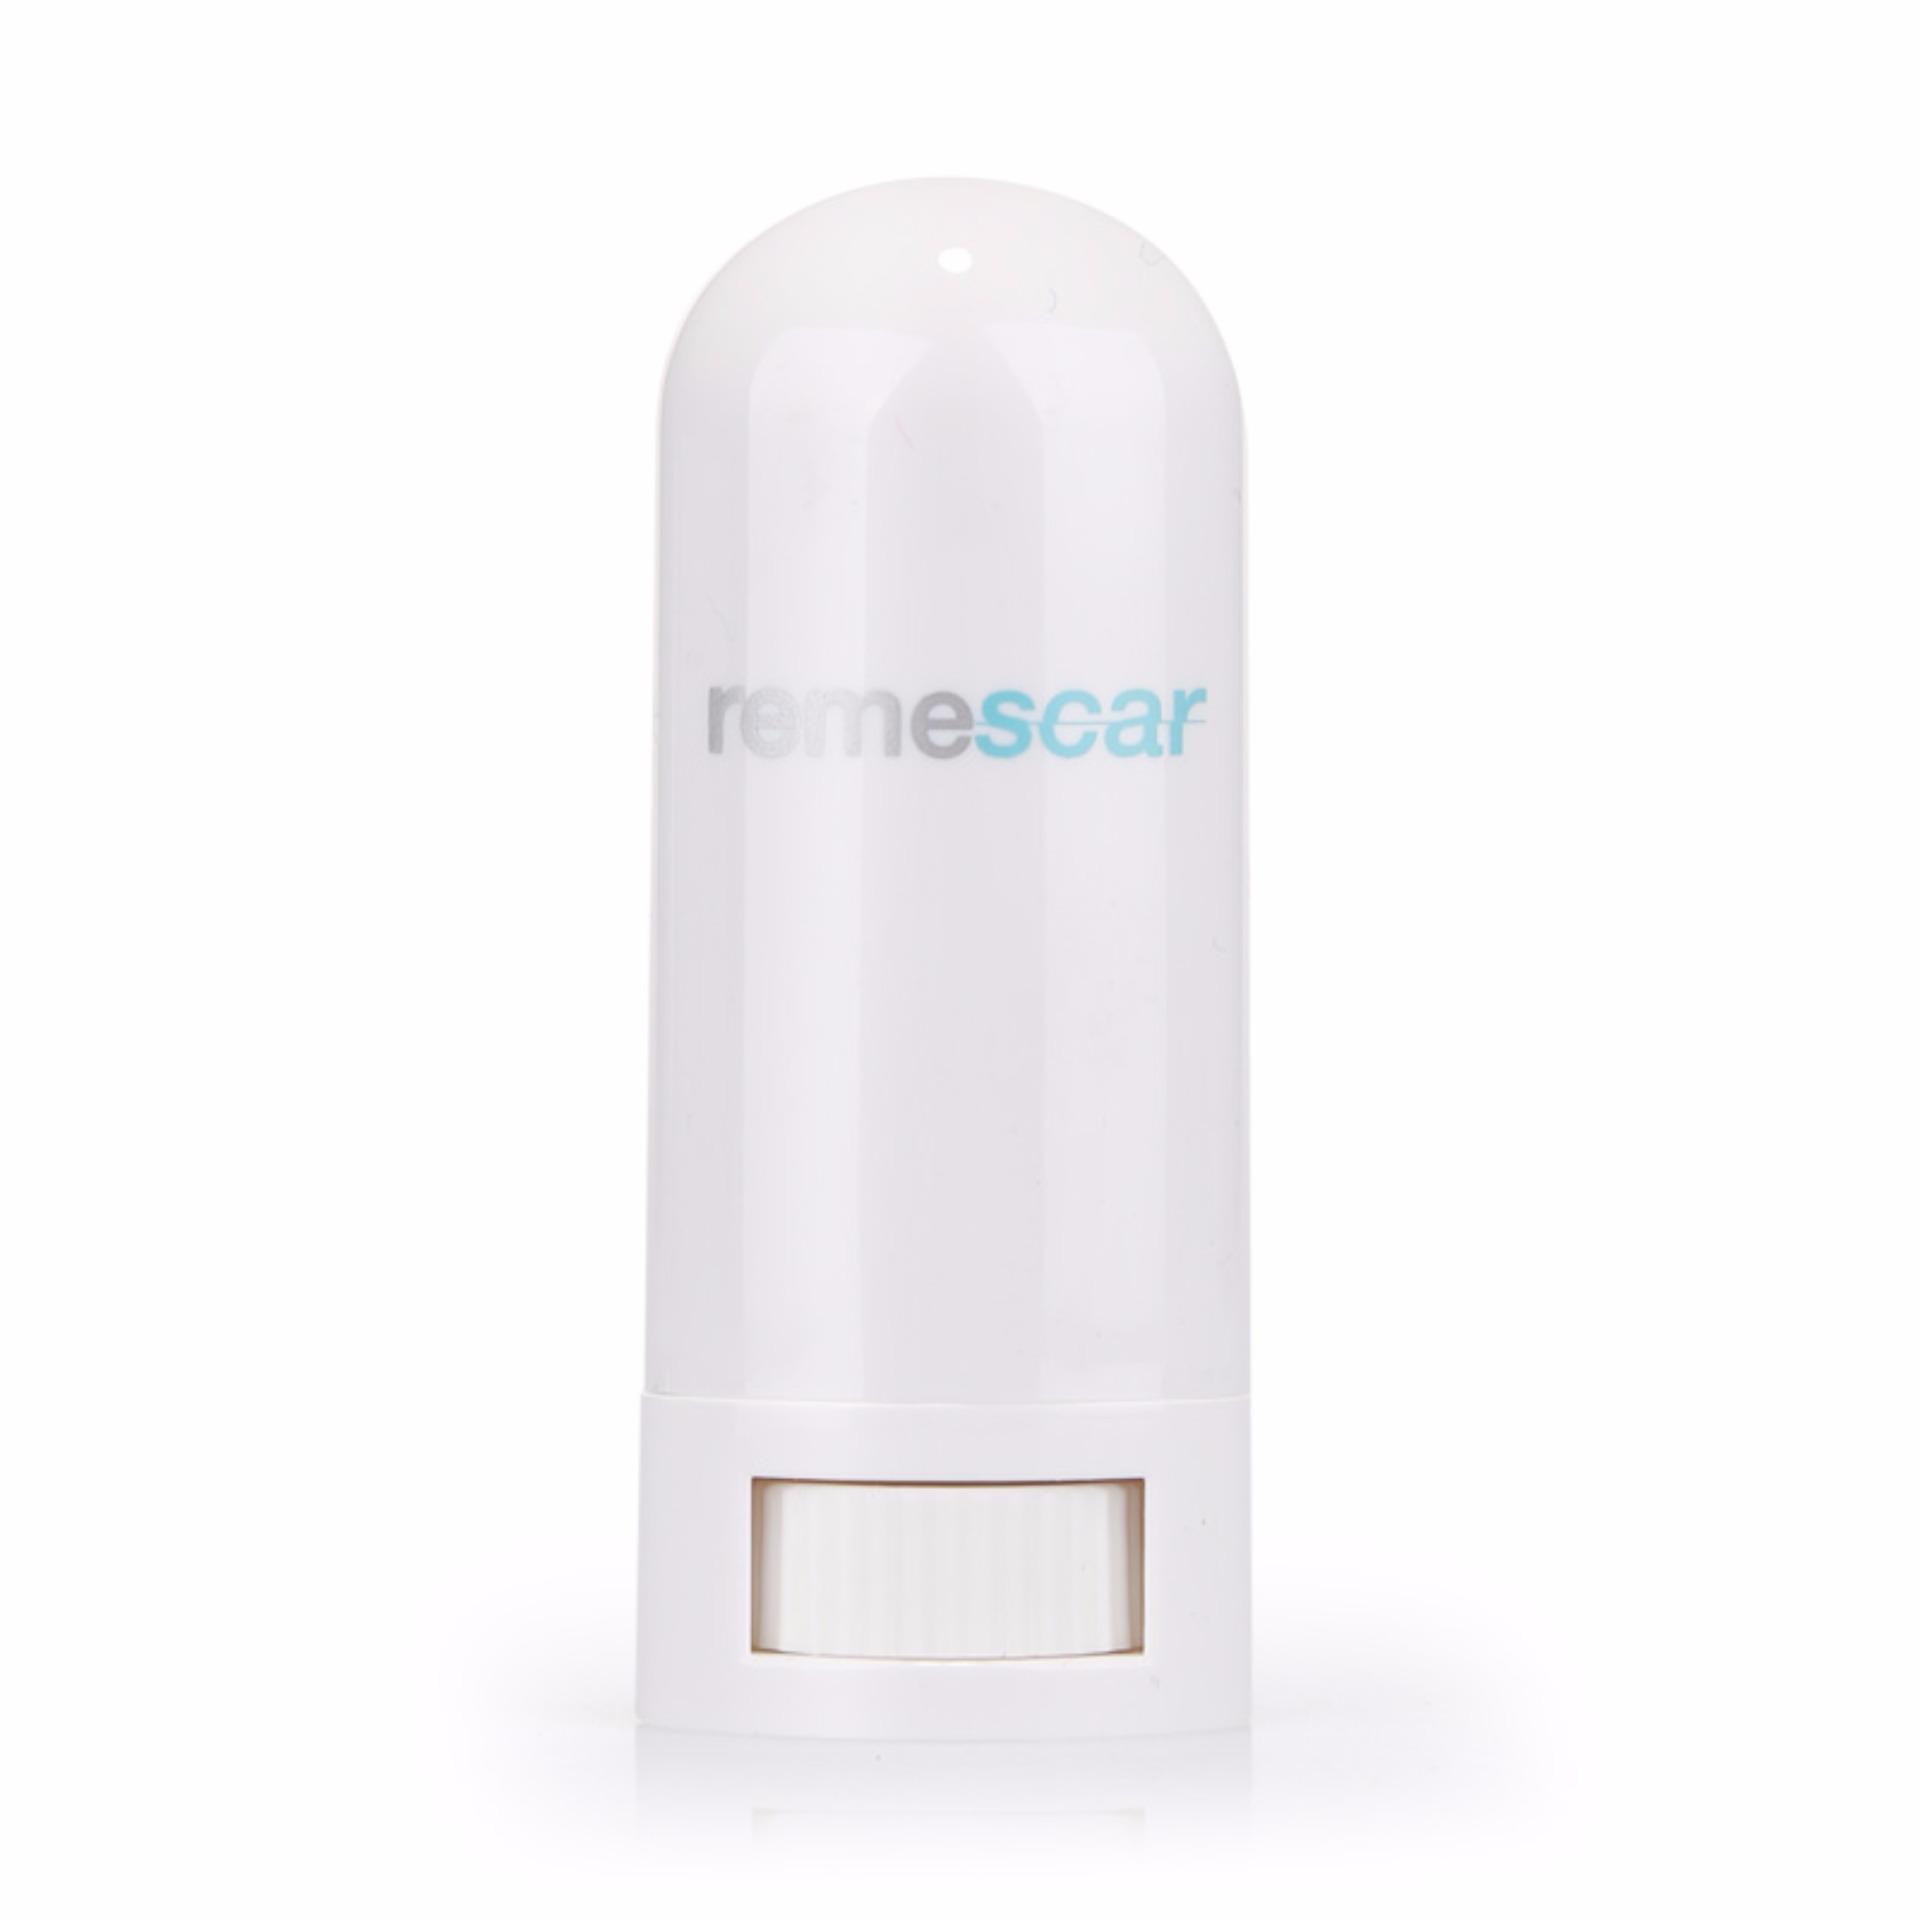 Remescar Silicone Scar Stick 10g